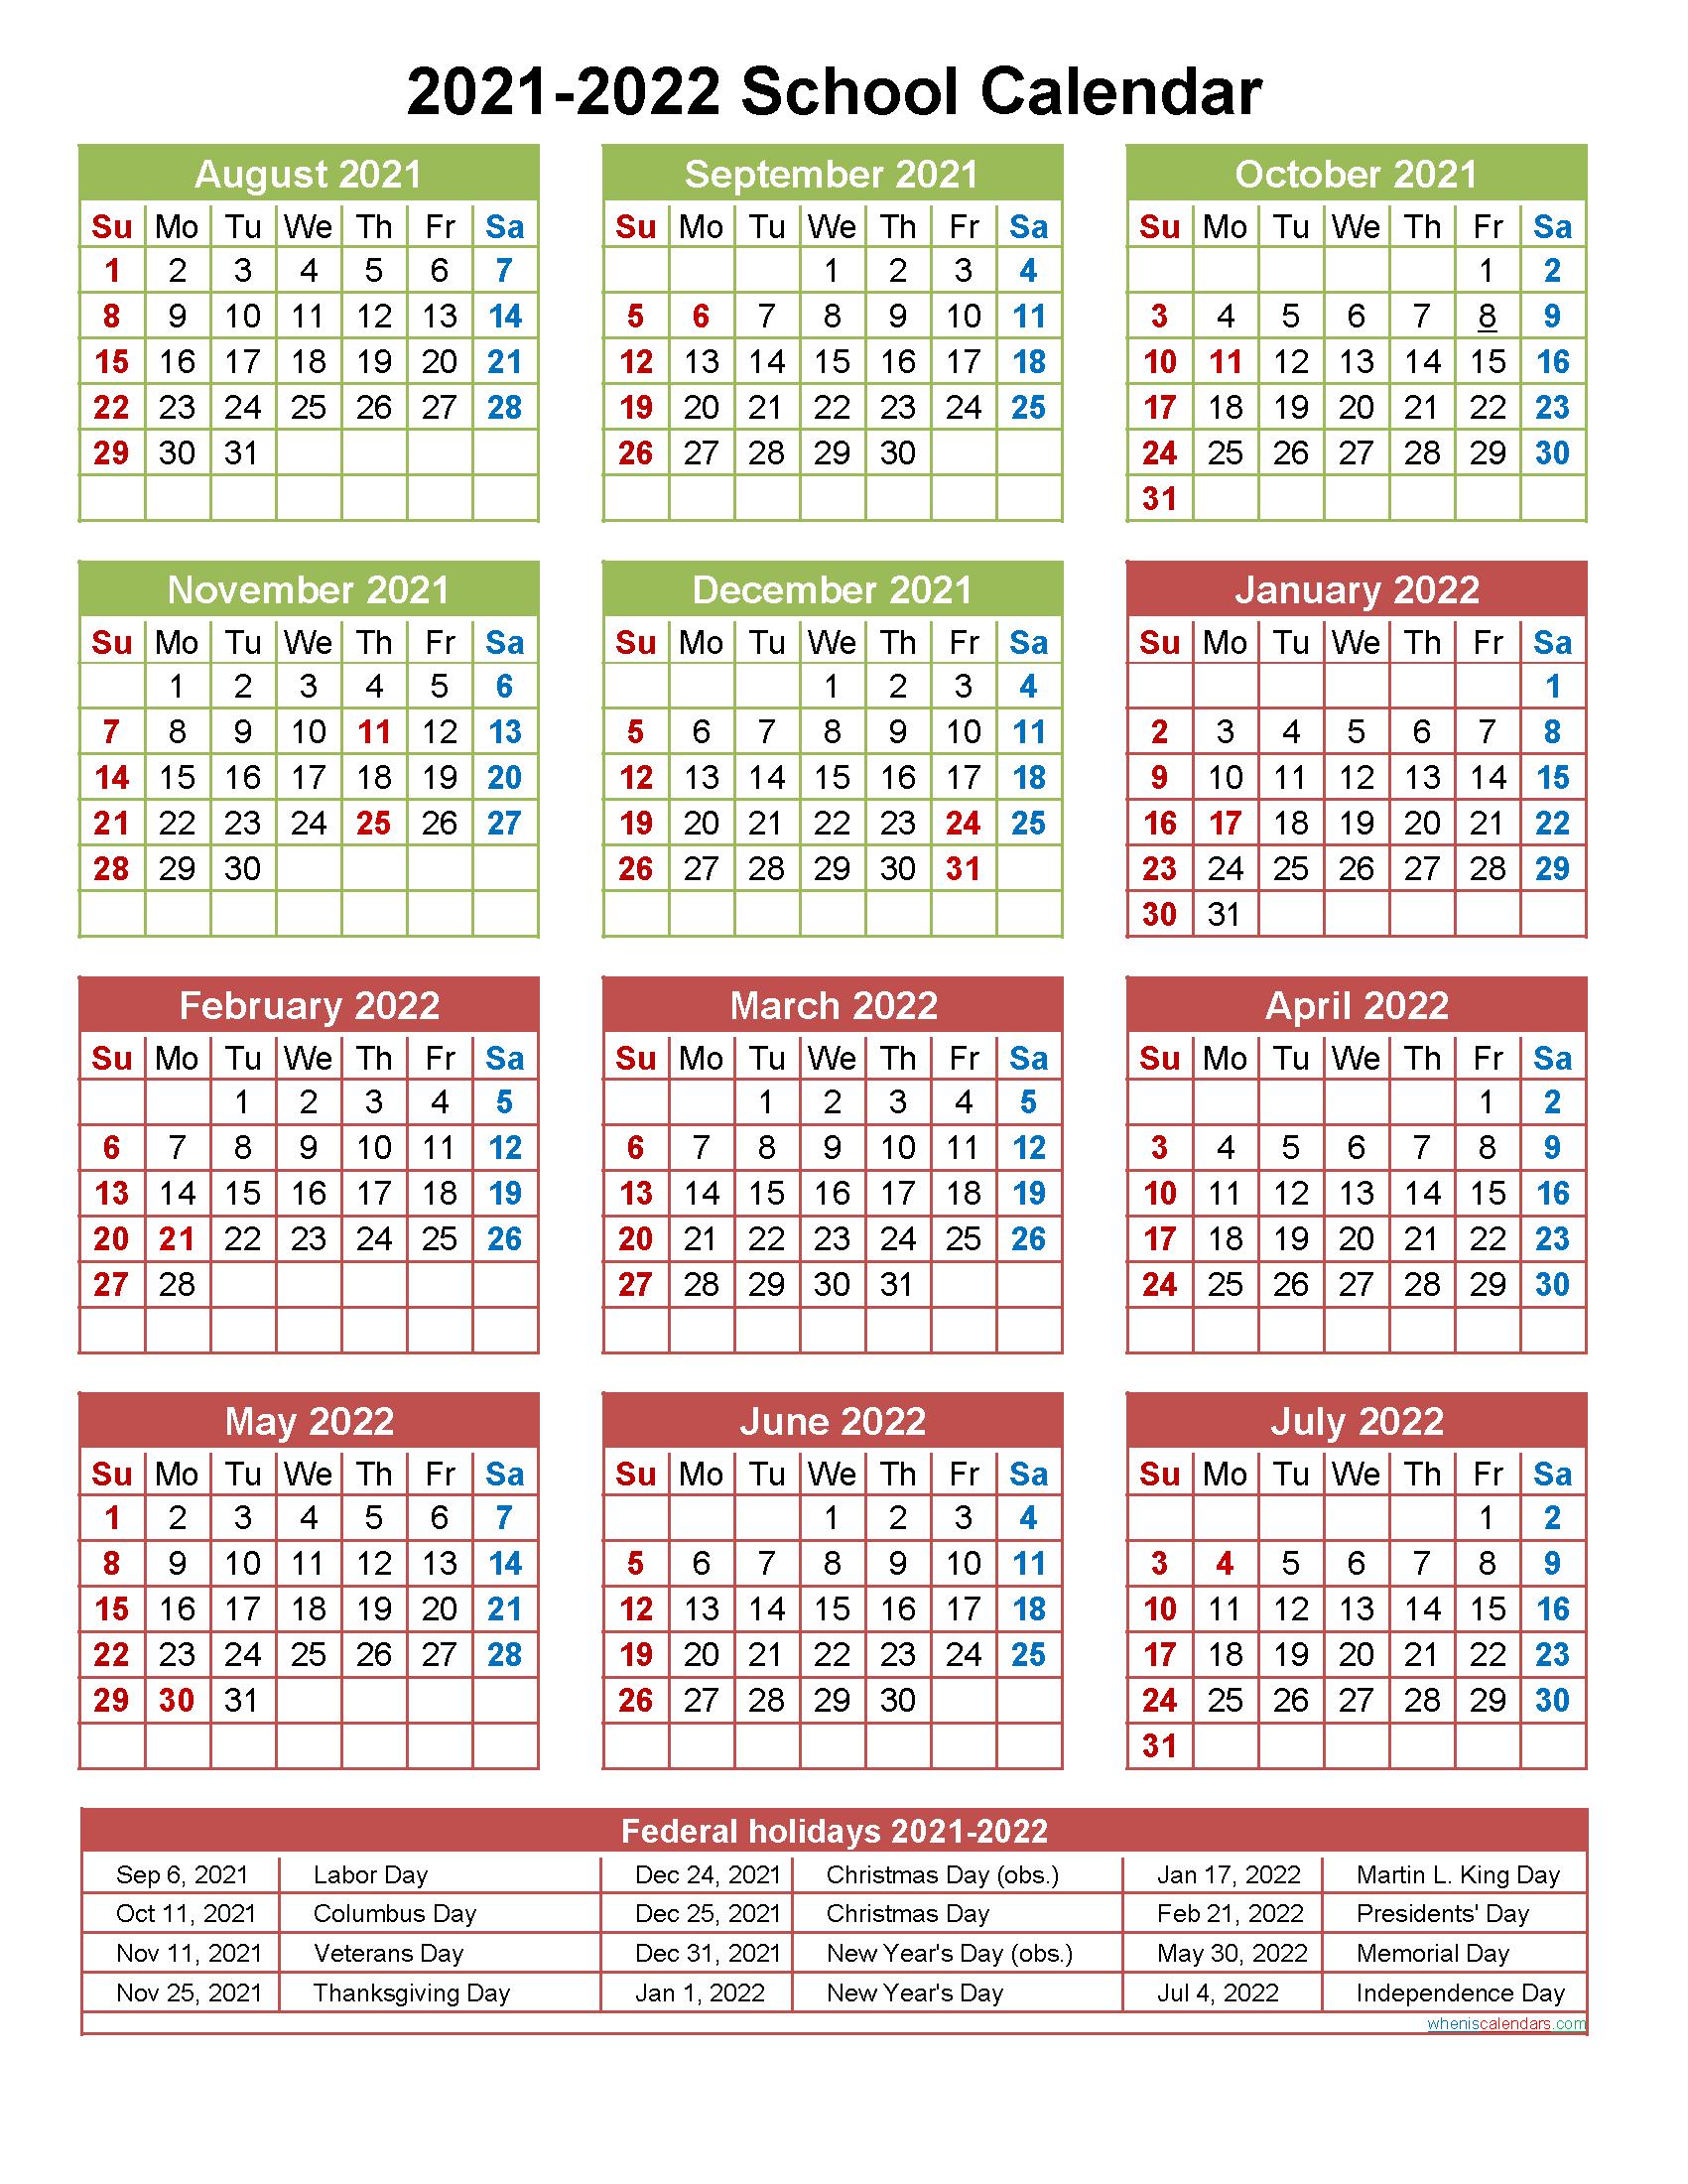 2021 And 2022 School Calendar Printable (Portrait With Billings School District 2 Calendar For 2021 2022